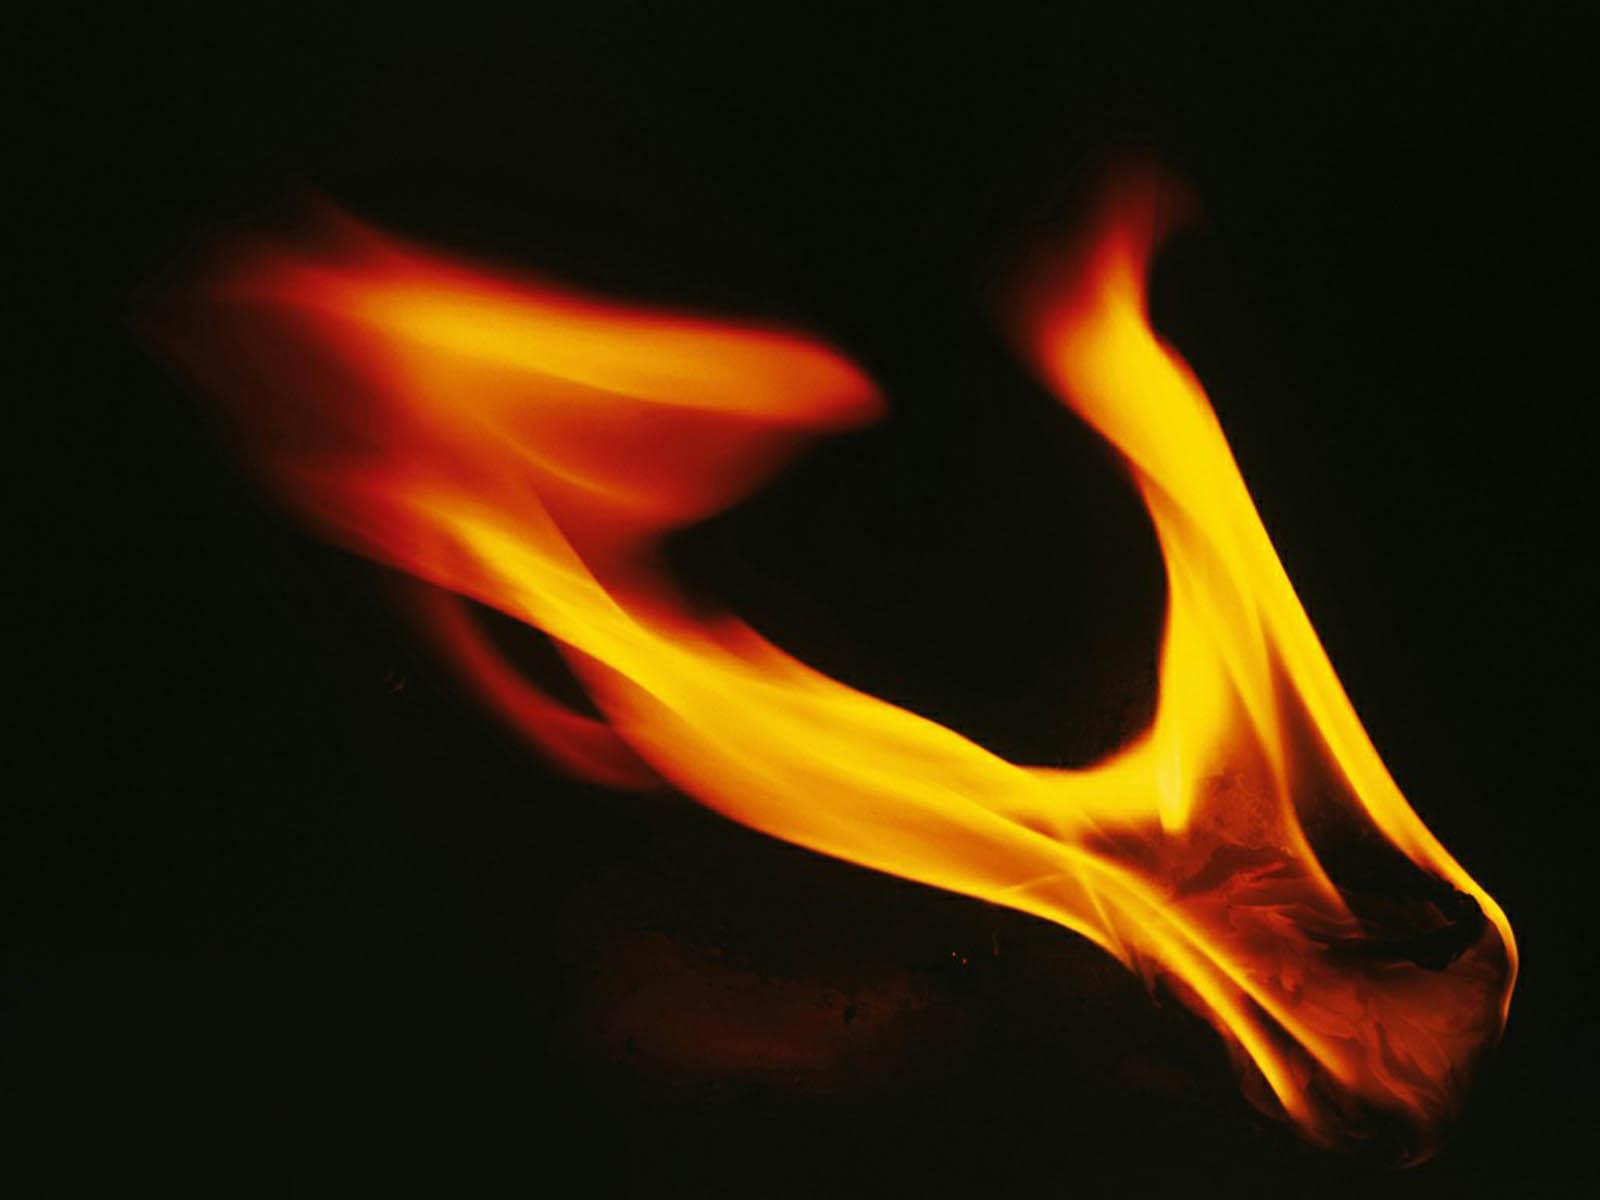 Fire Wallpaper Pc: Wallpaper: Fire Wallpapers